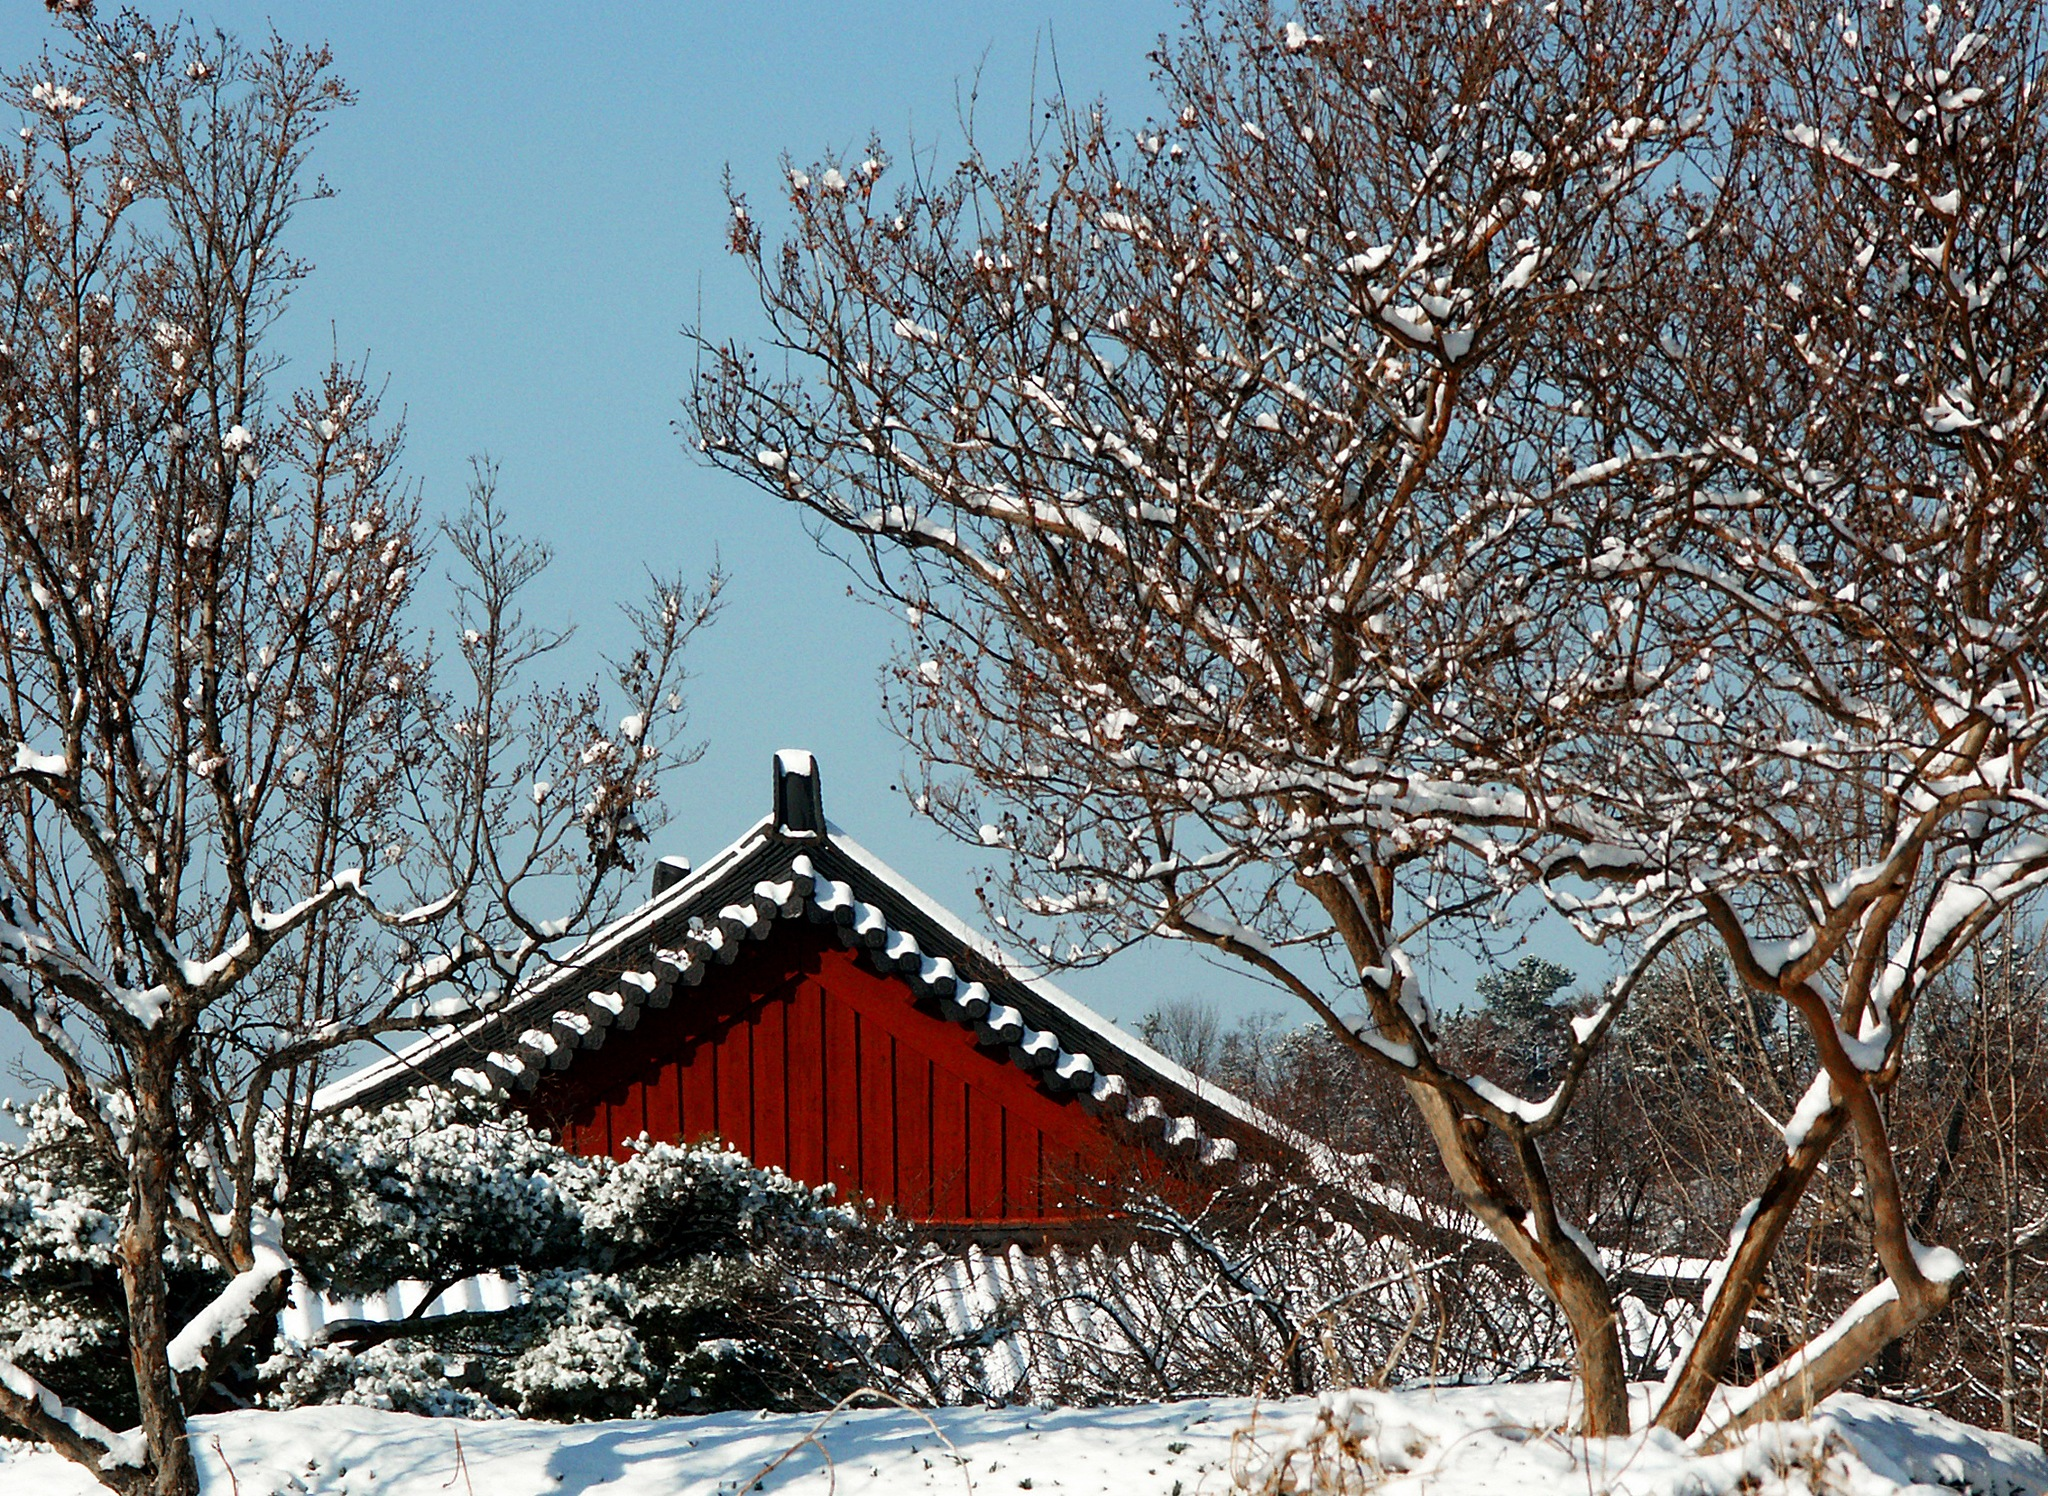 A Snowy Day in Korea by Steve Garrigues